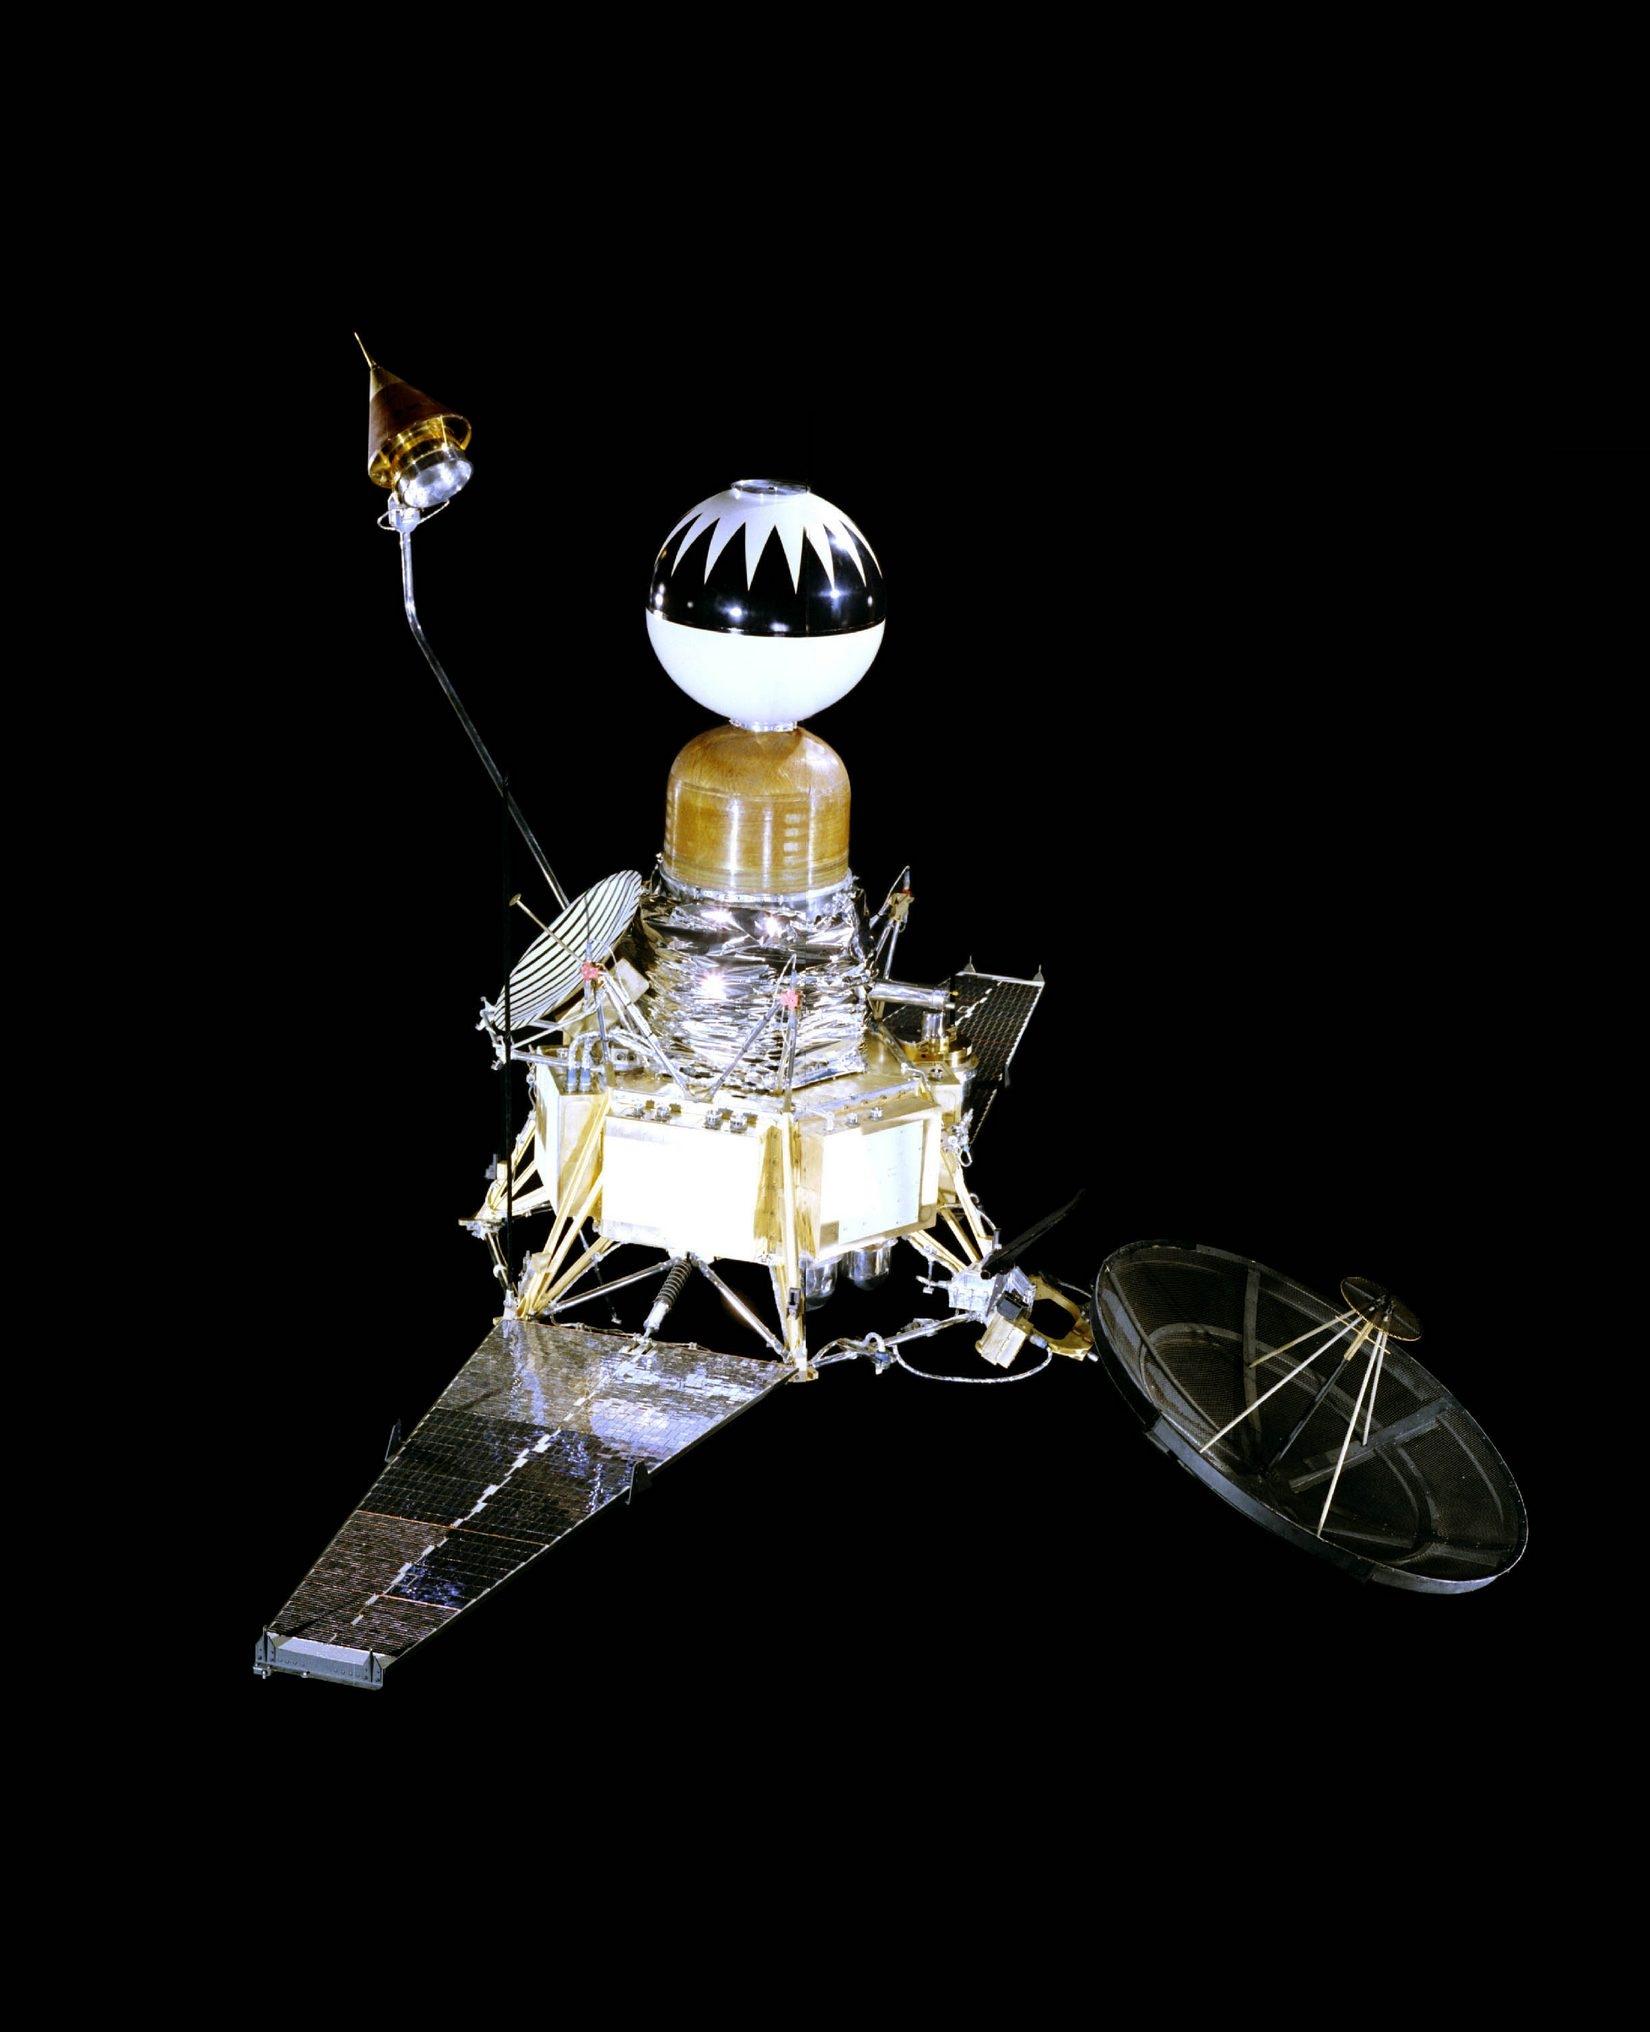 nasa ranger spacecrafts - 700×700